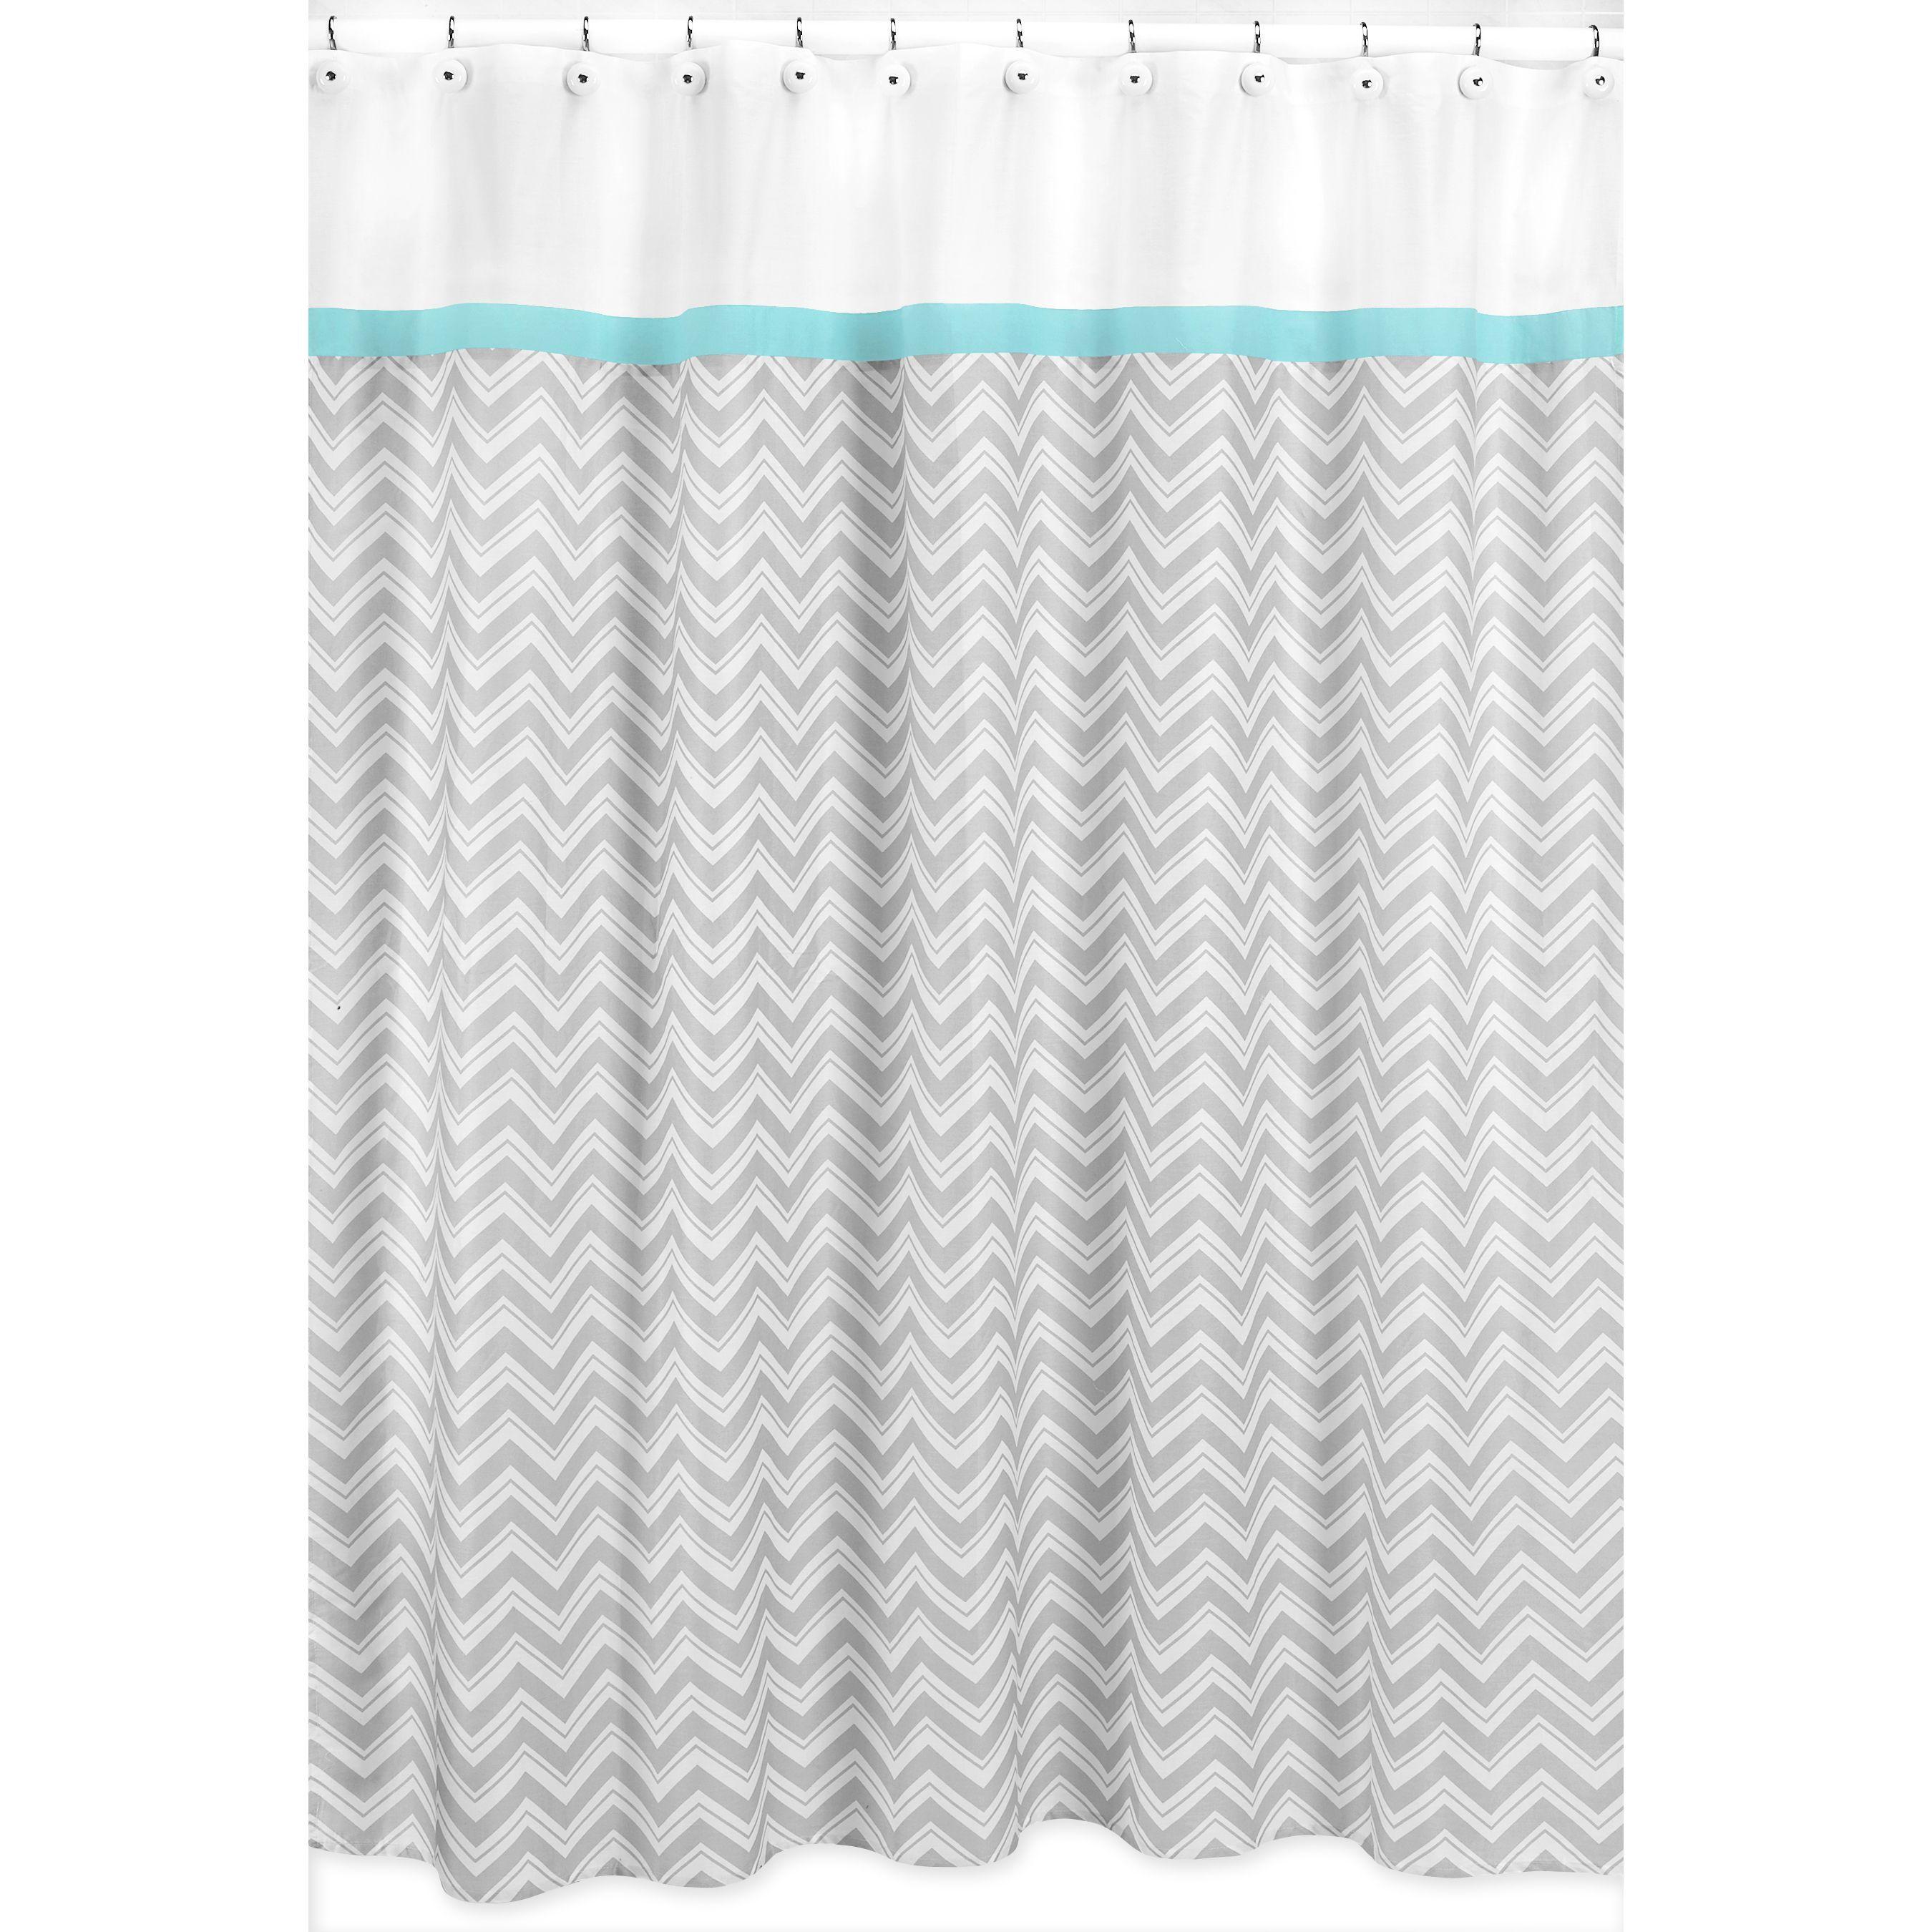 Sweet Jojo Designs Shower Curtain 5 Percent Cash Back